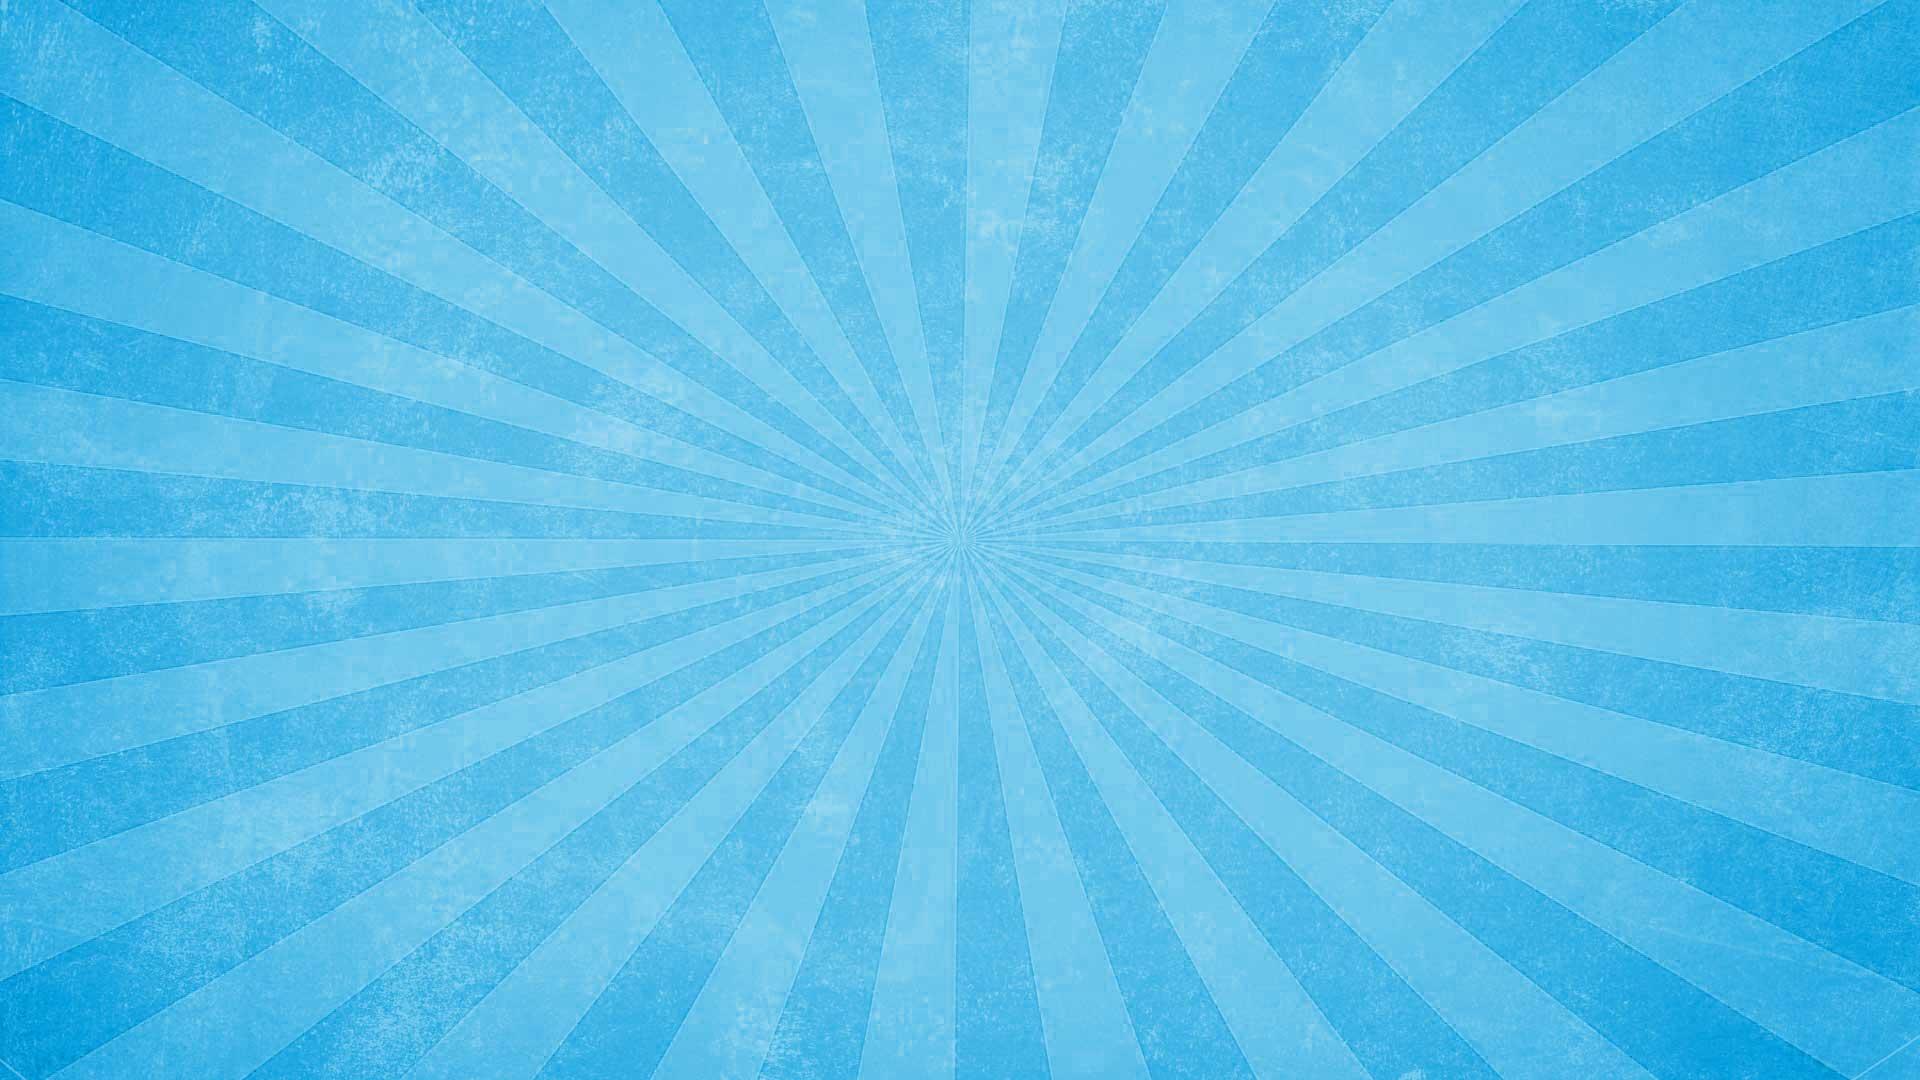 blue starburst background 1   Background Check All